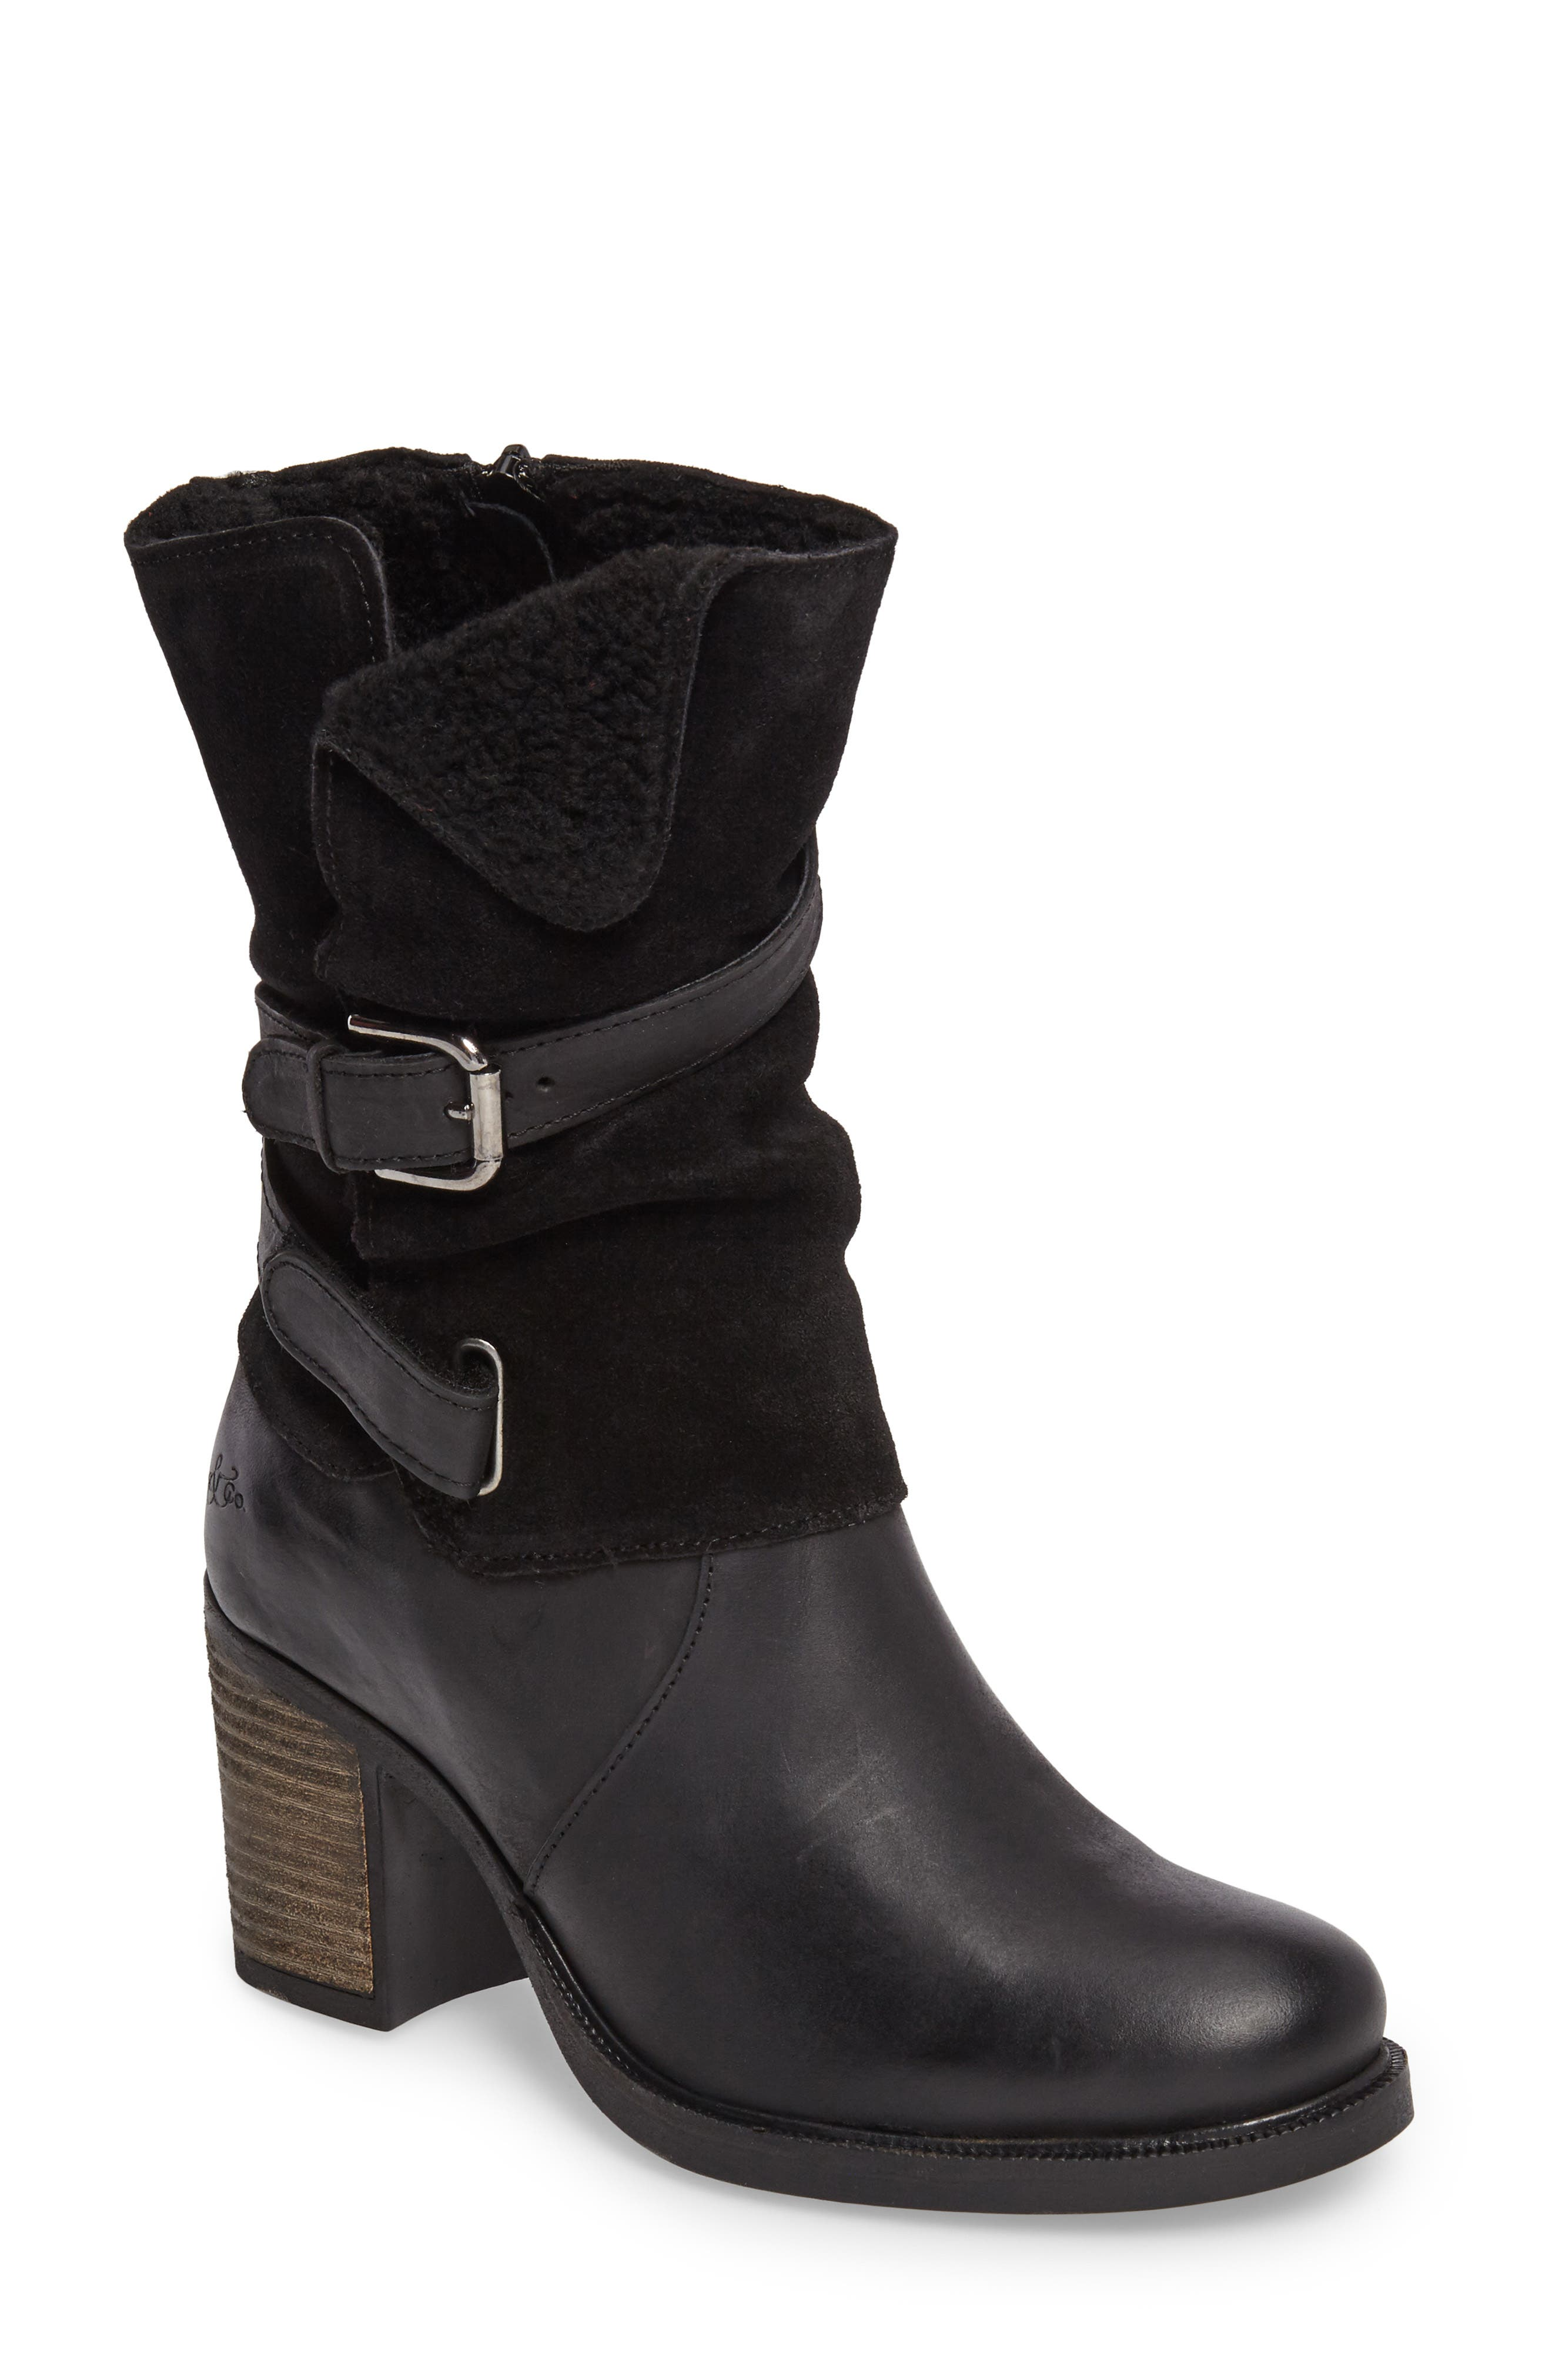 Alternate Image 1 Selected - Bos. & Co. Borne Waterproof Boot (Women)